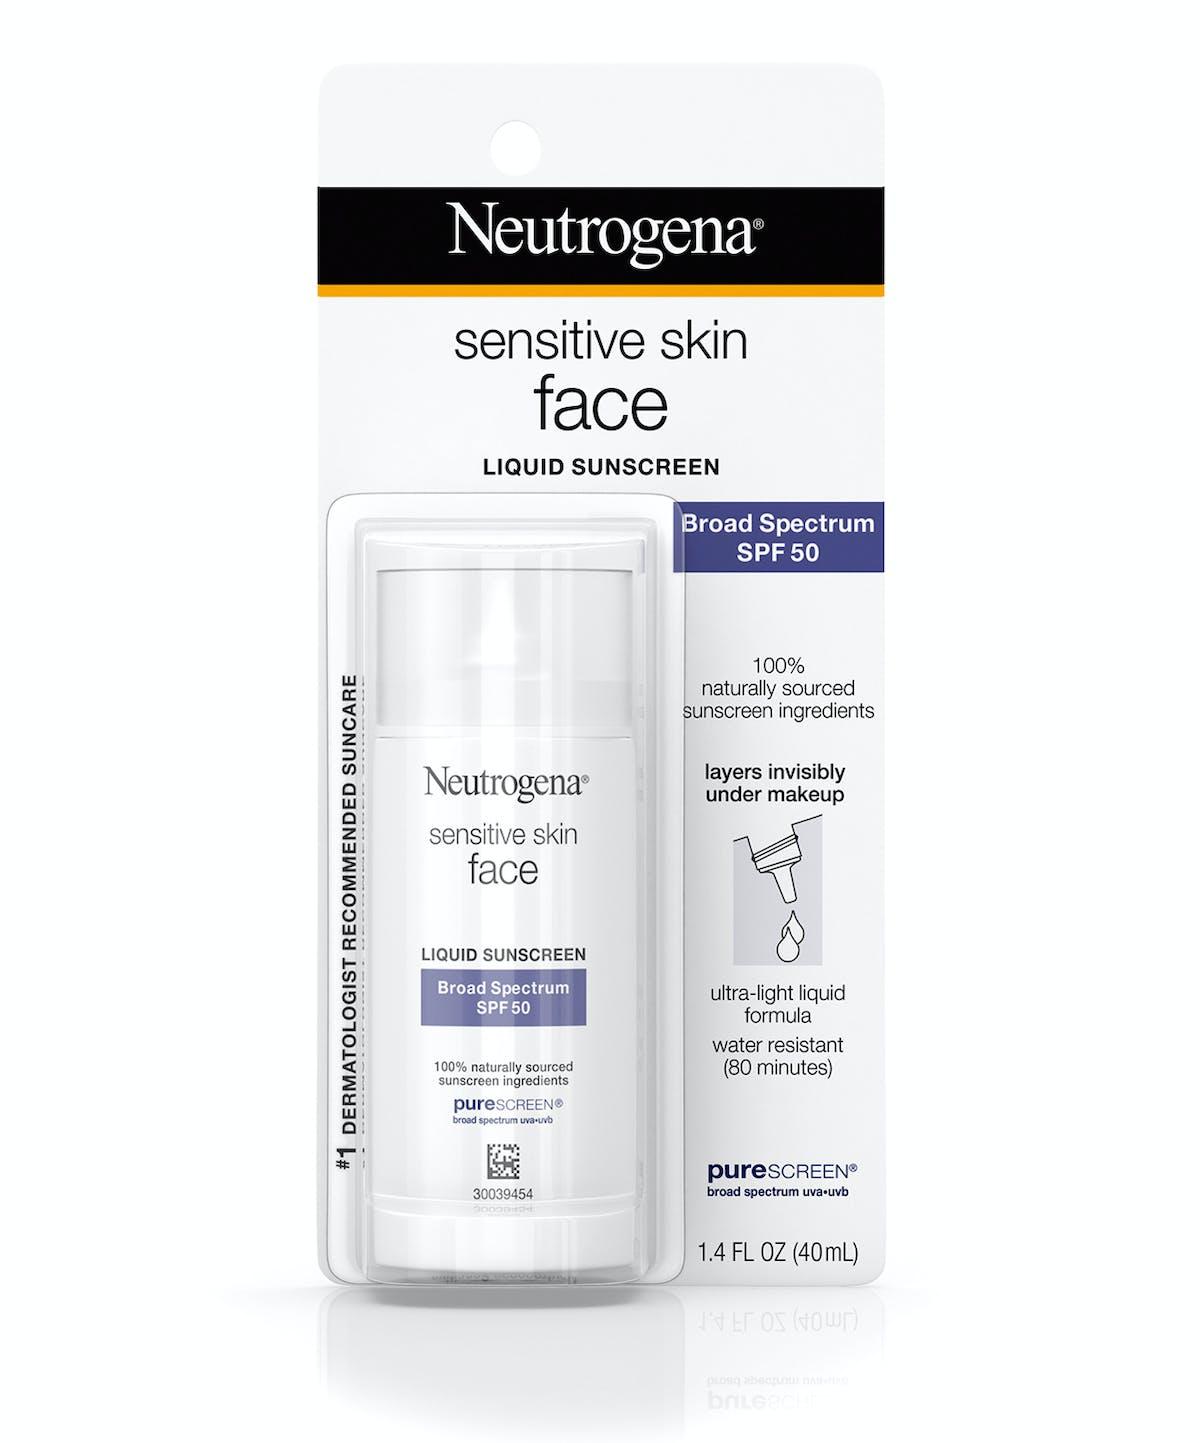 Neutrogena® Sensitive Skin Face Liquid Sunscreen Broad Spectrum SPF 50